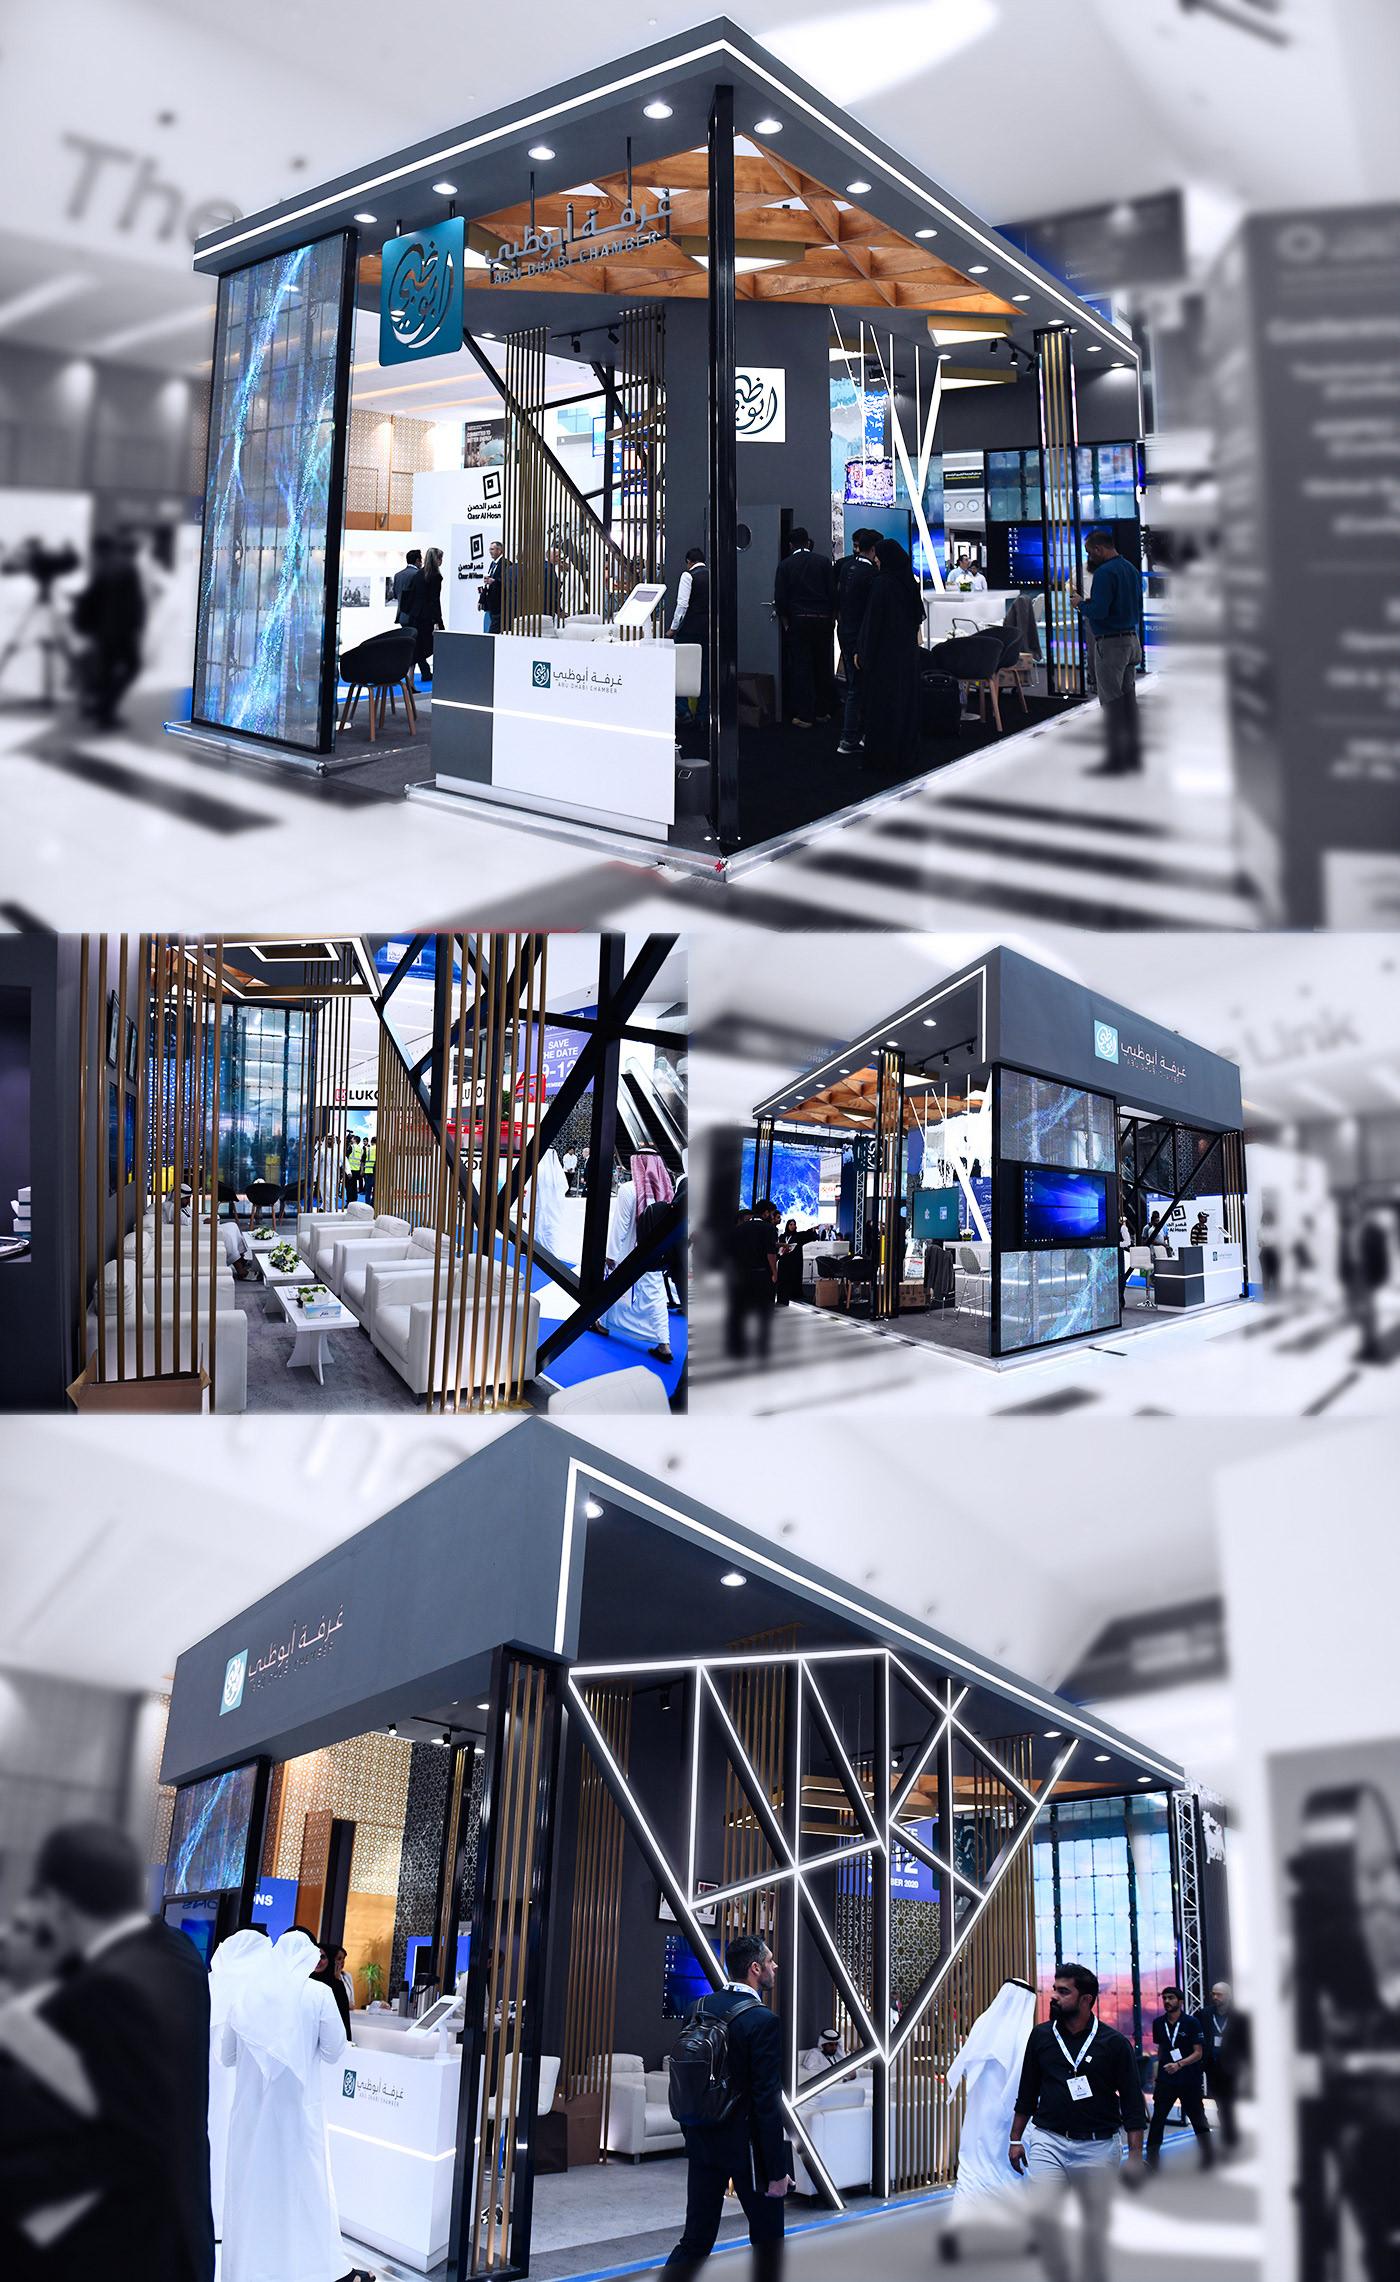 Abu Dhabe chamber exhibitiondesign diegogugelmin brazukaz designs uaeadipec